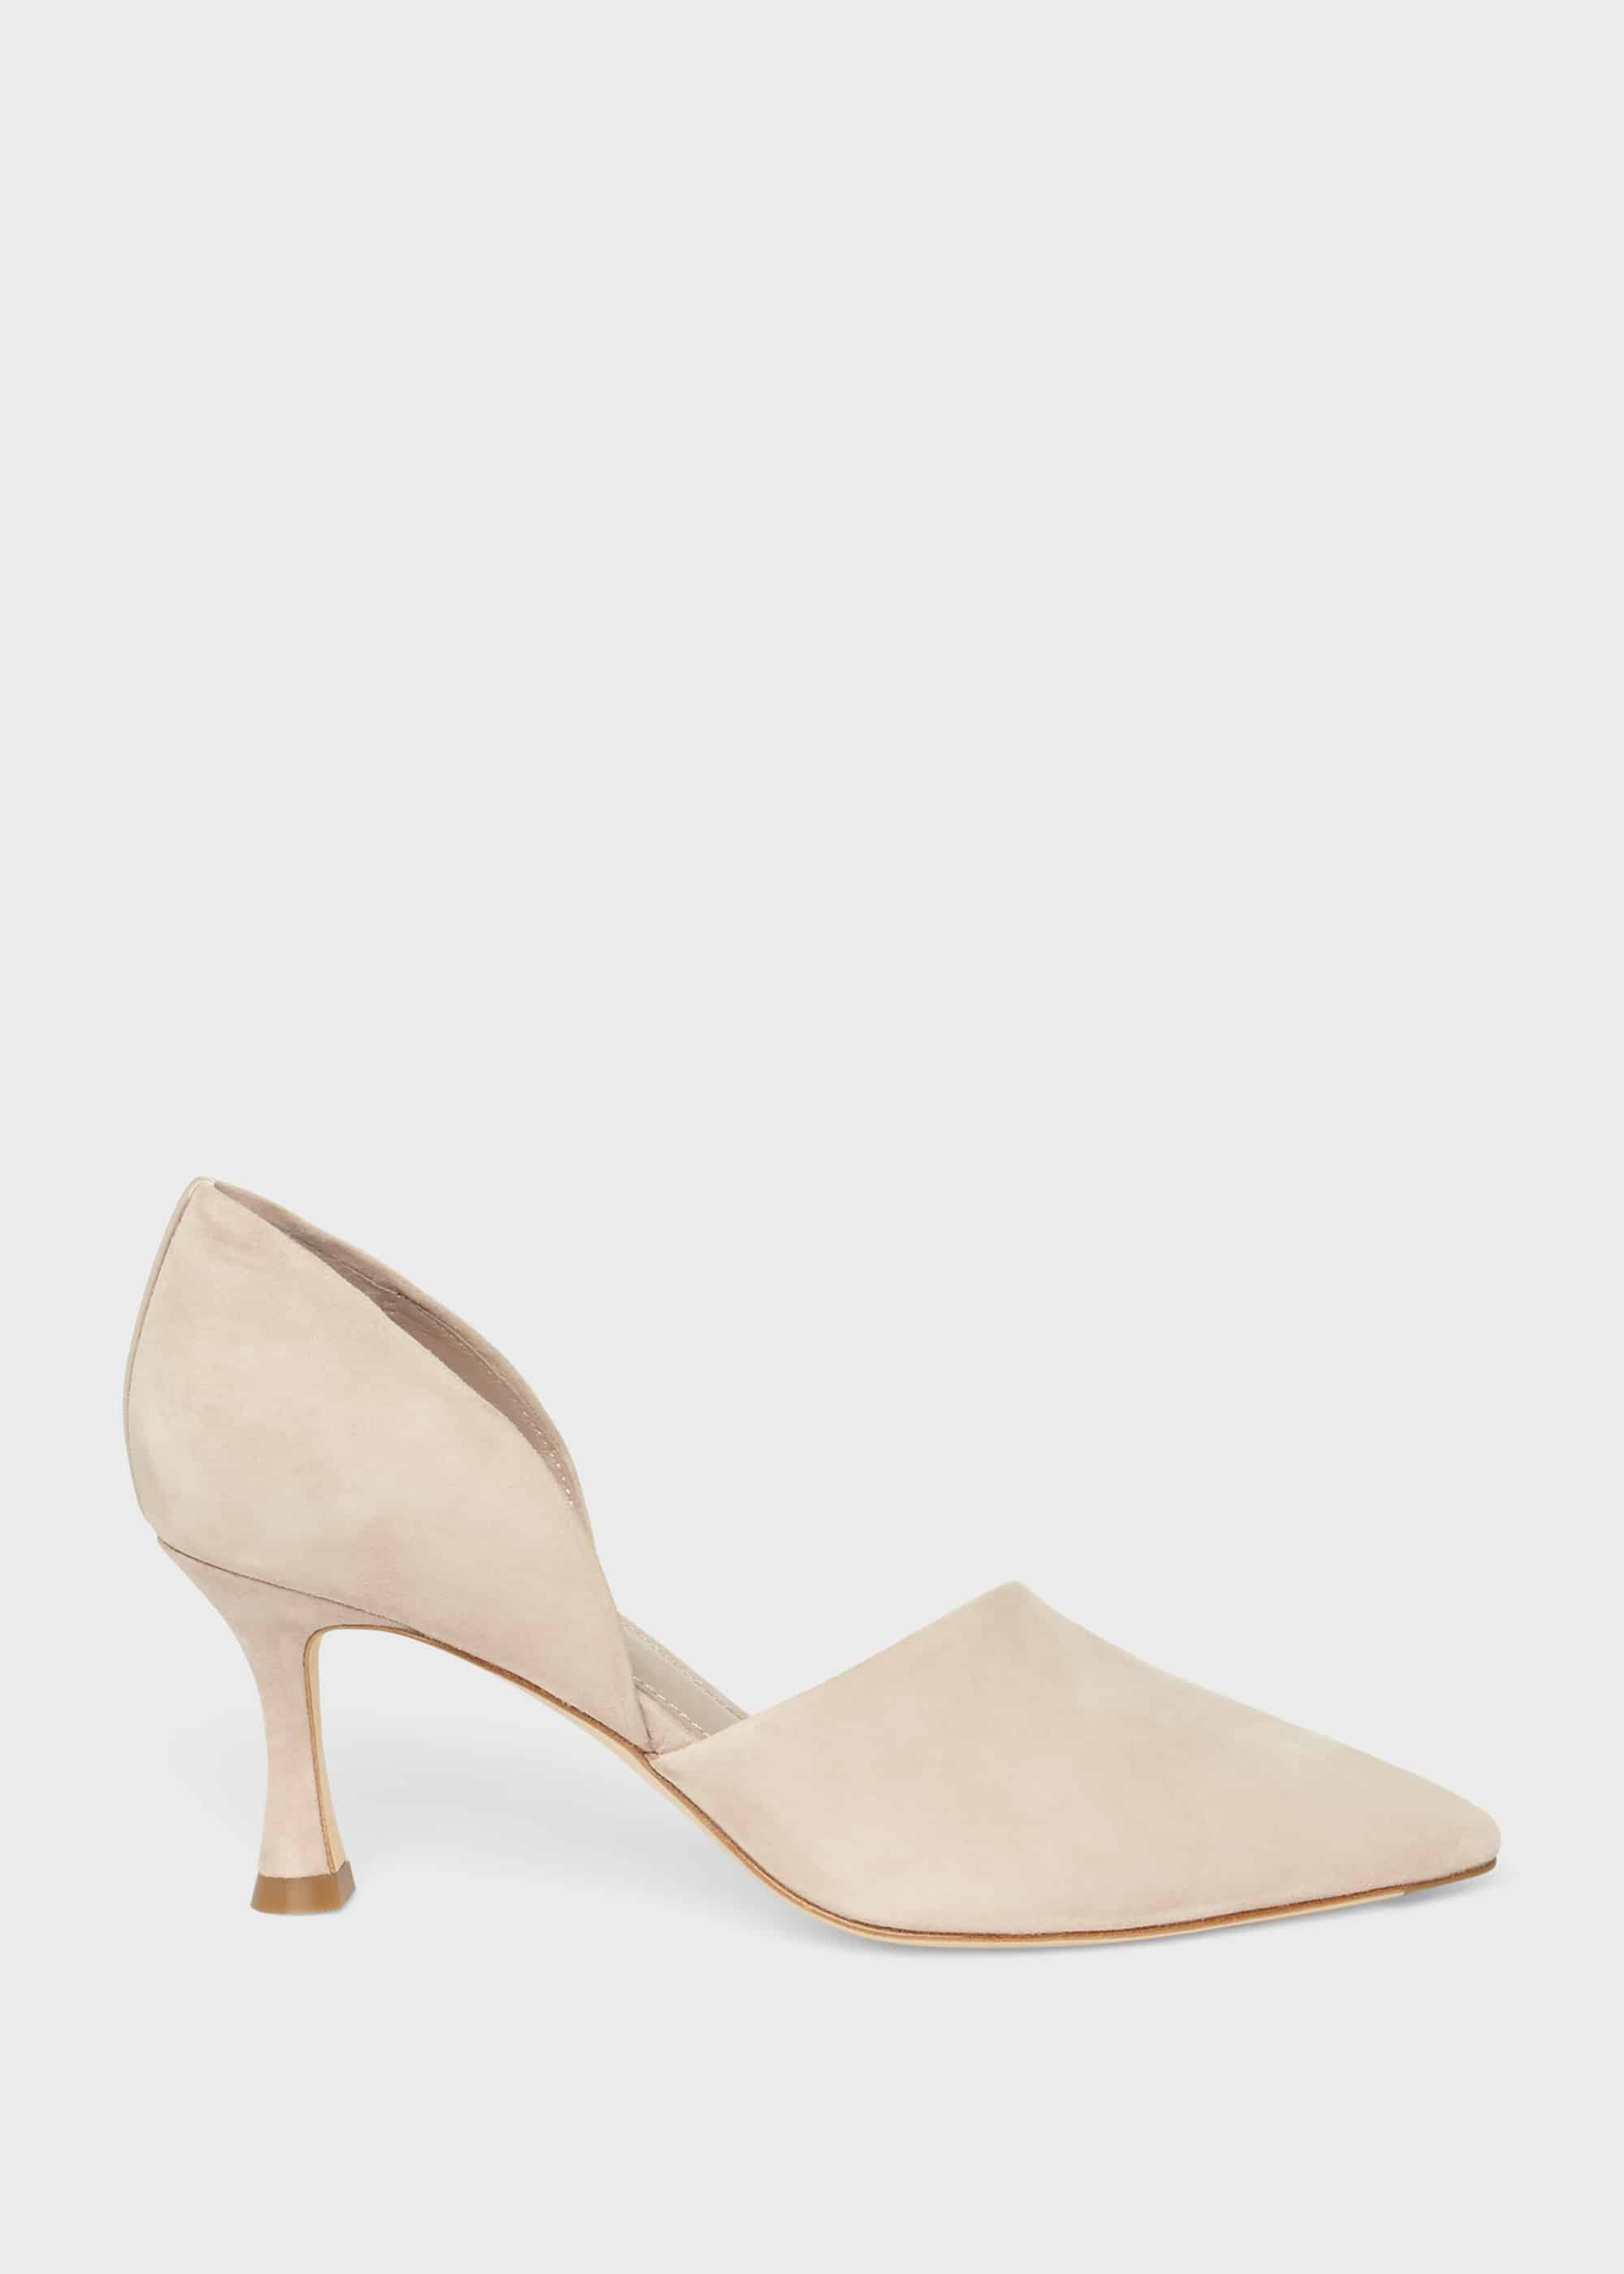 Hobbs Women Maya Suede D'Orsay Court Shoes